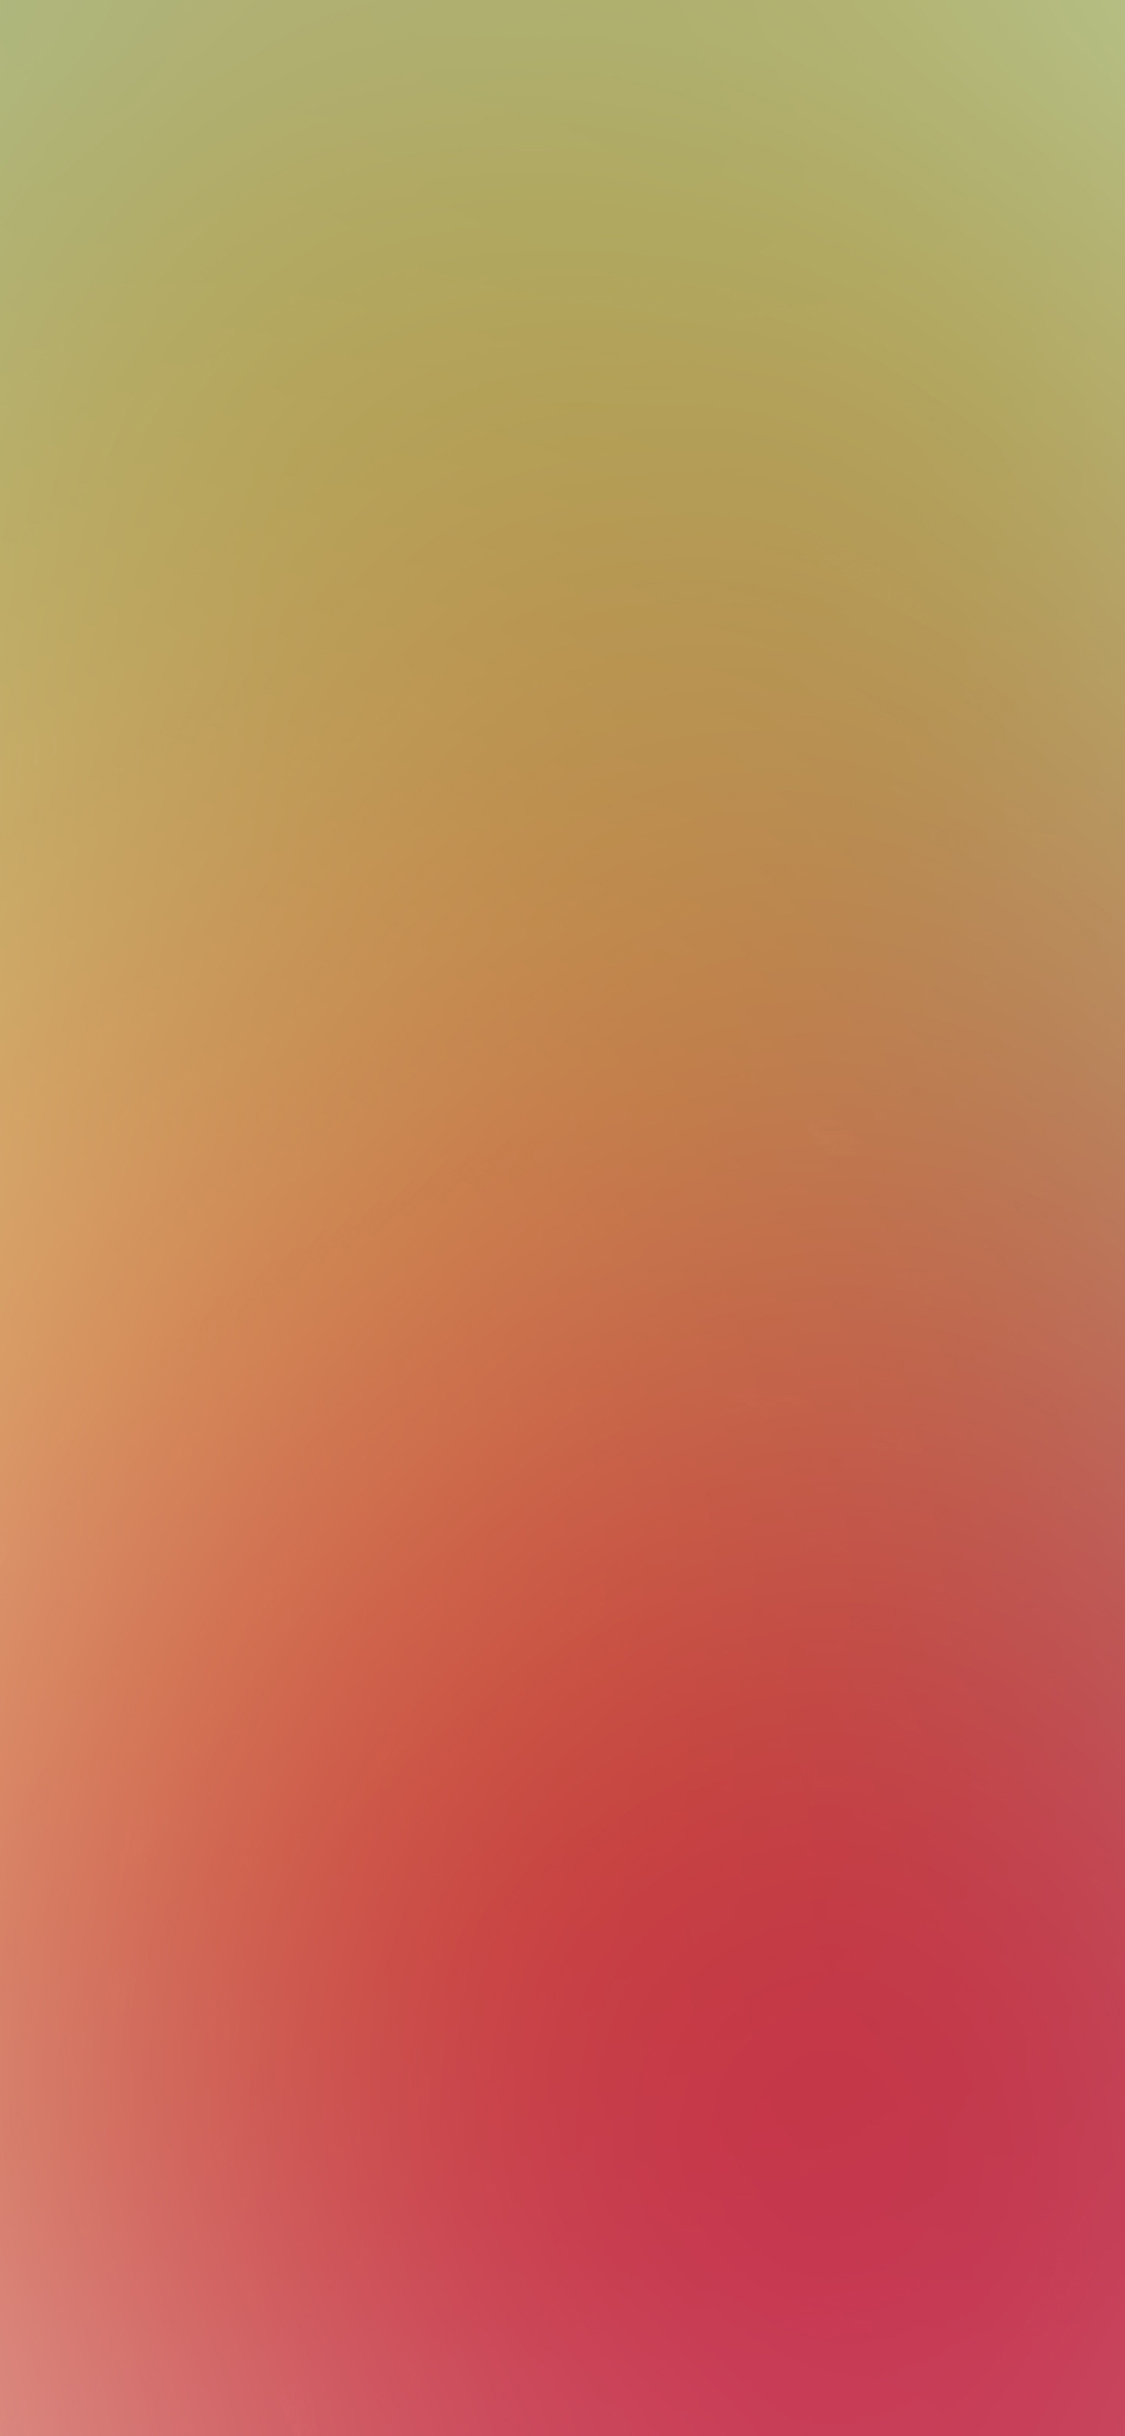 iPhoneXpapers.com-Apple-iPhone-wallpaper-sd70-pink-peach-yellow-lemon-gradation-blur